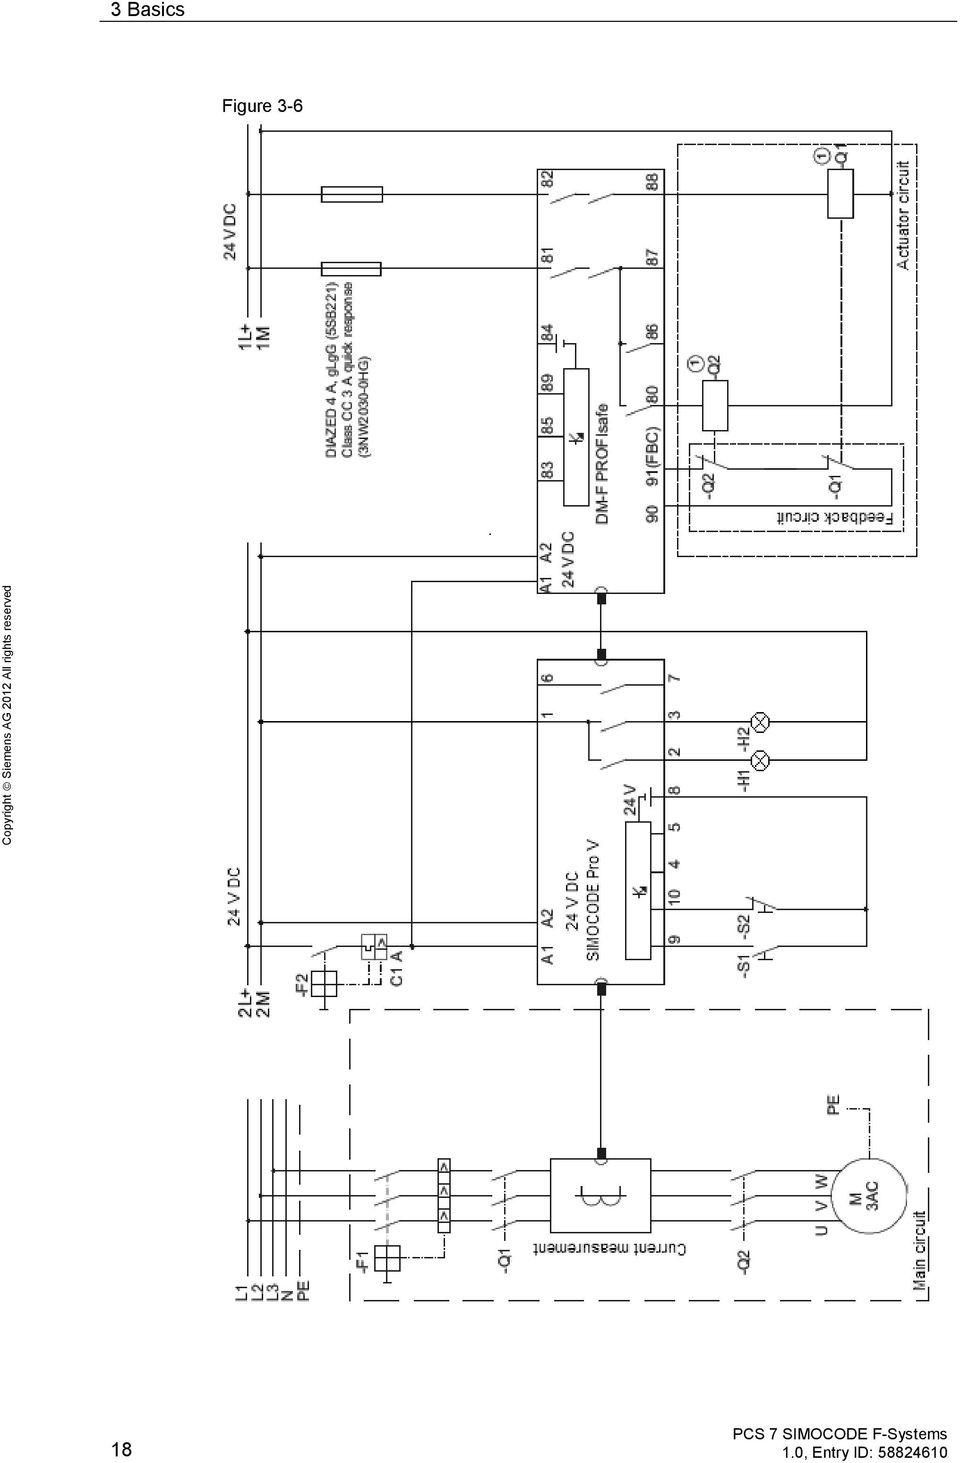 Applications & Tools. Integration SIMOCODE pro V with a